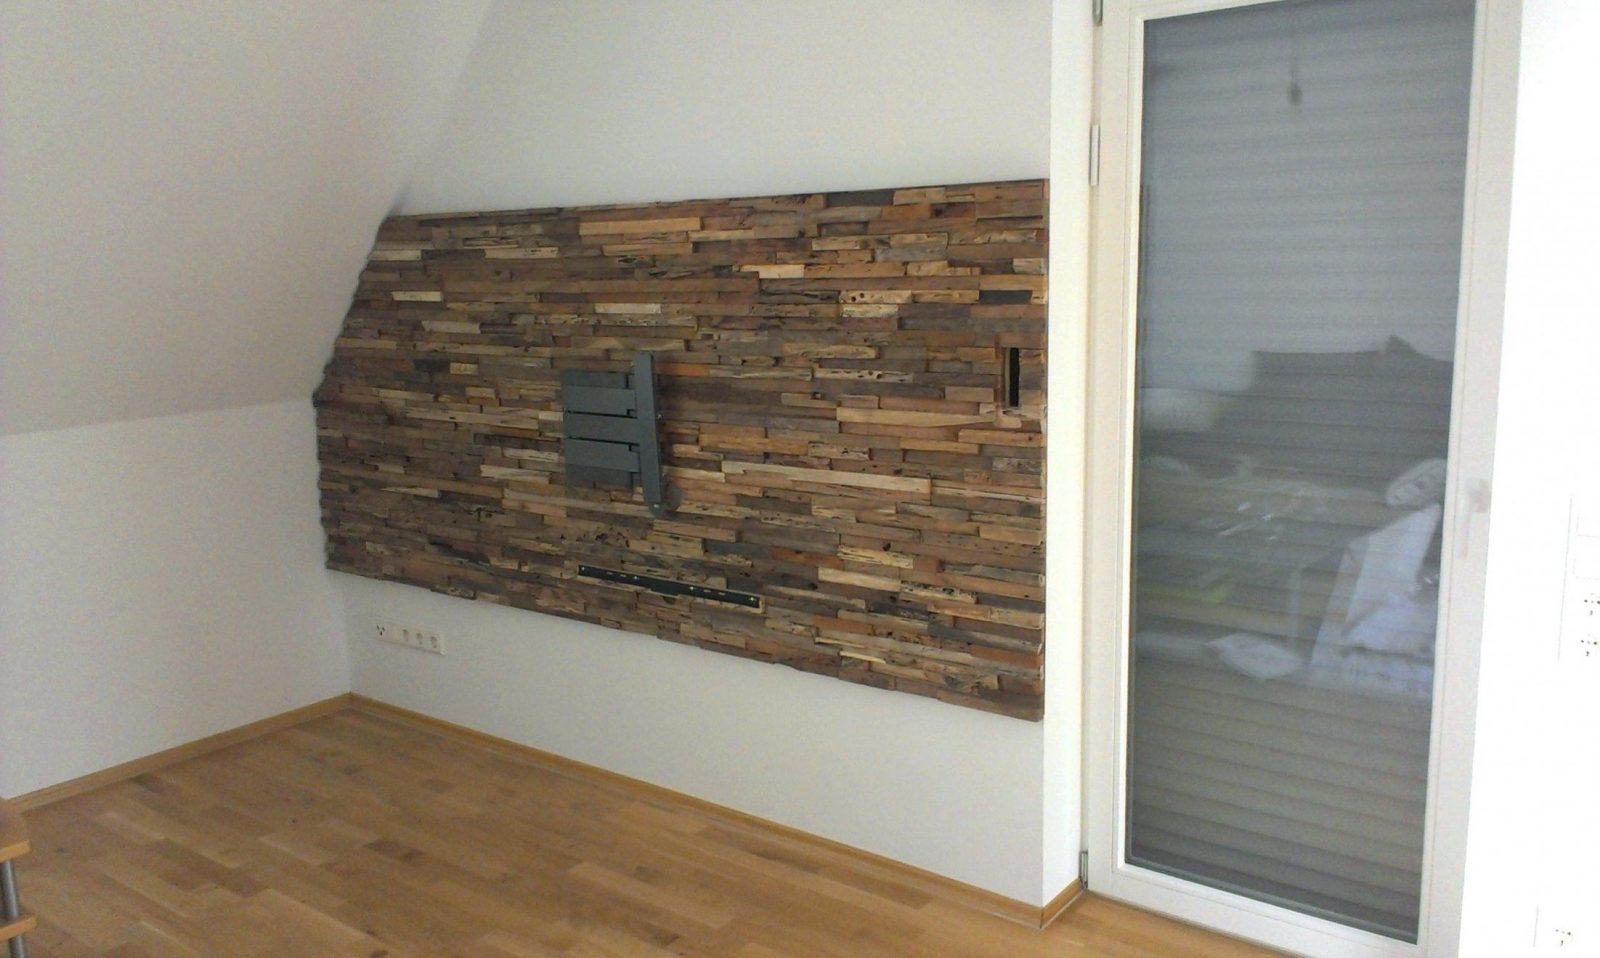 Wandverkleidung Holz Selber Bauen Wandverkleidungen Granit von Holz Wandverkleidung Selber Machen Photo